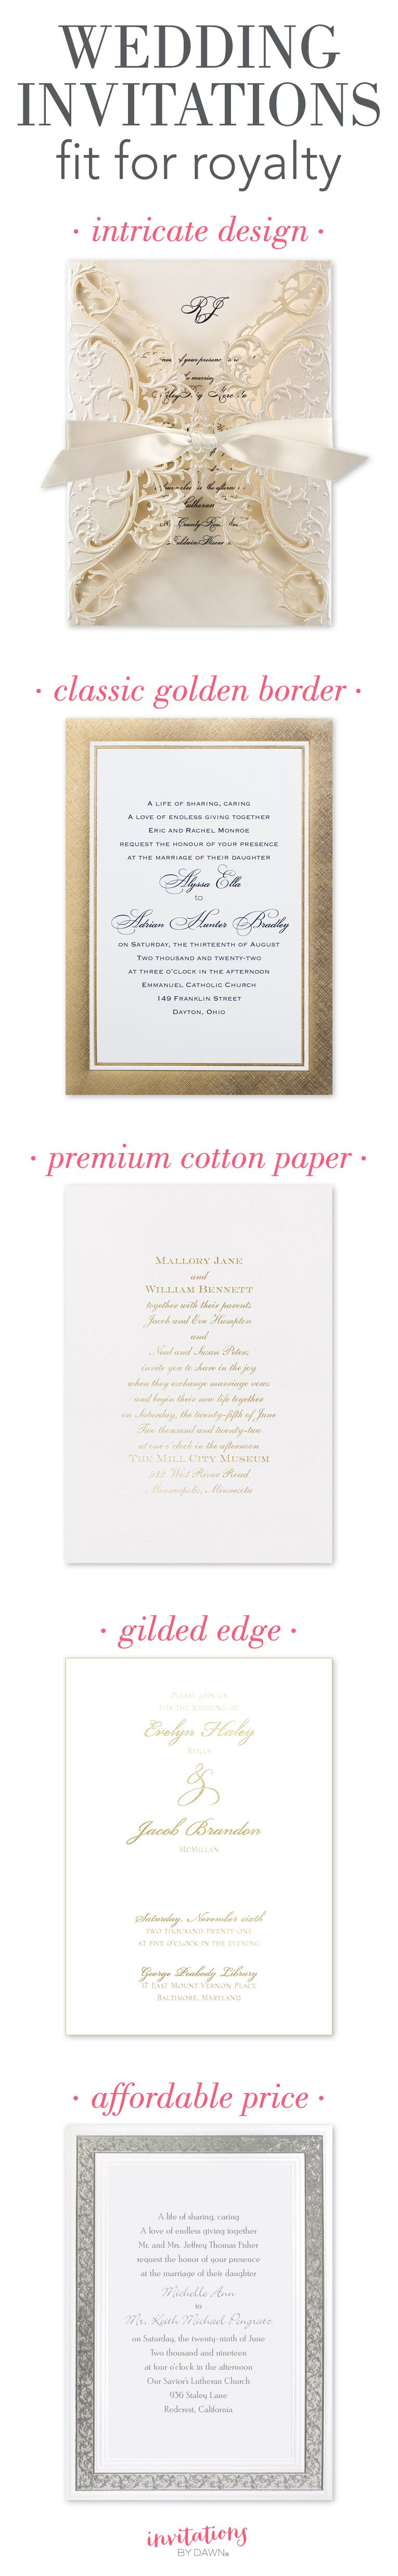 Wedding Invitations Fit for Royalty | Pinterest | Royal wedding ...